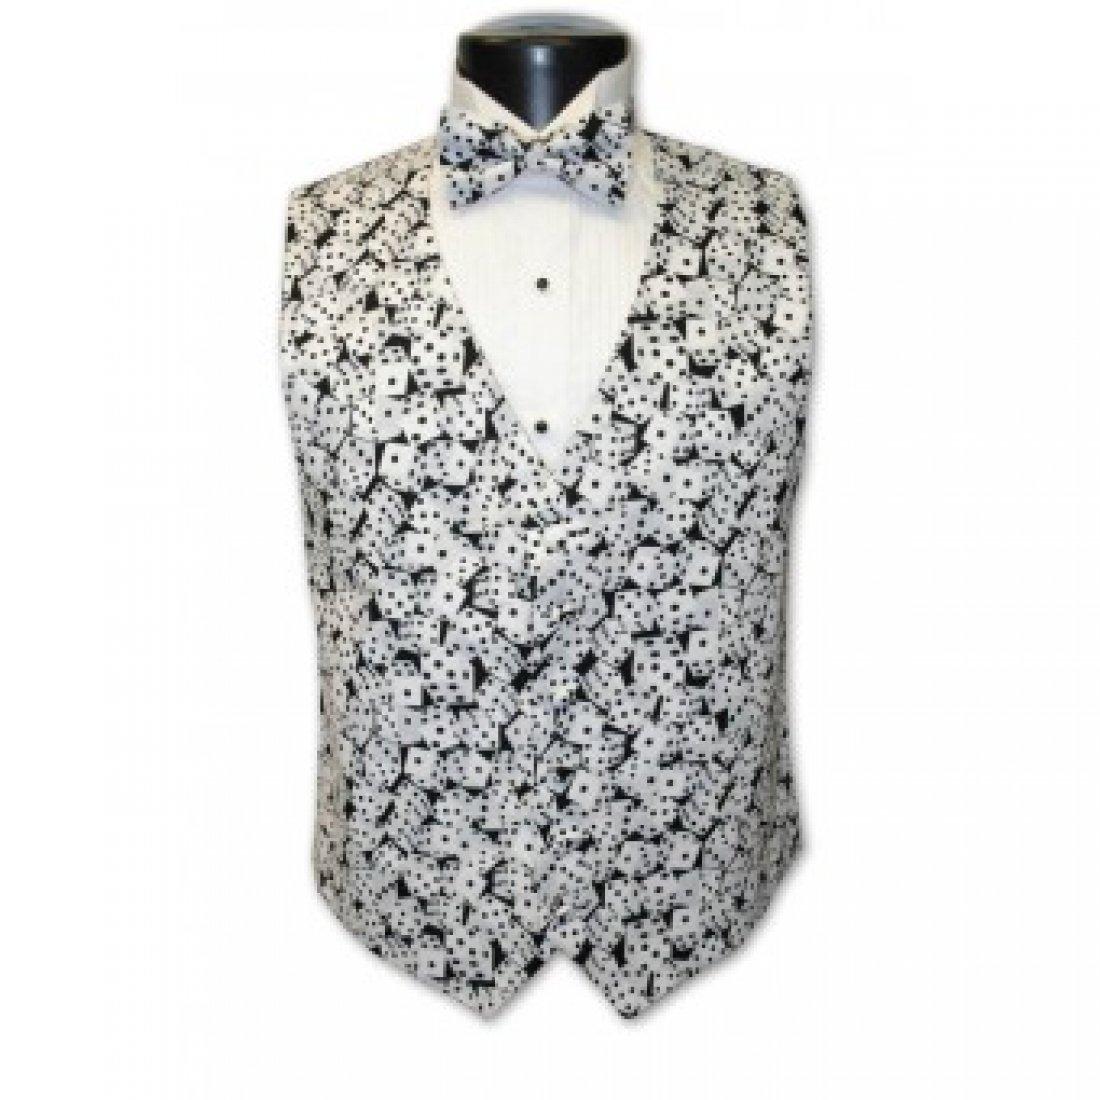 Vegas Black and White Dice Tuxedo Vest and Bow Tie Size Medium